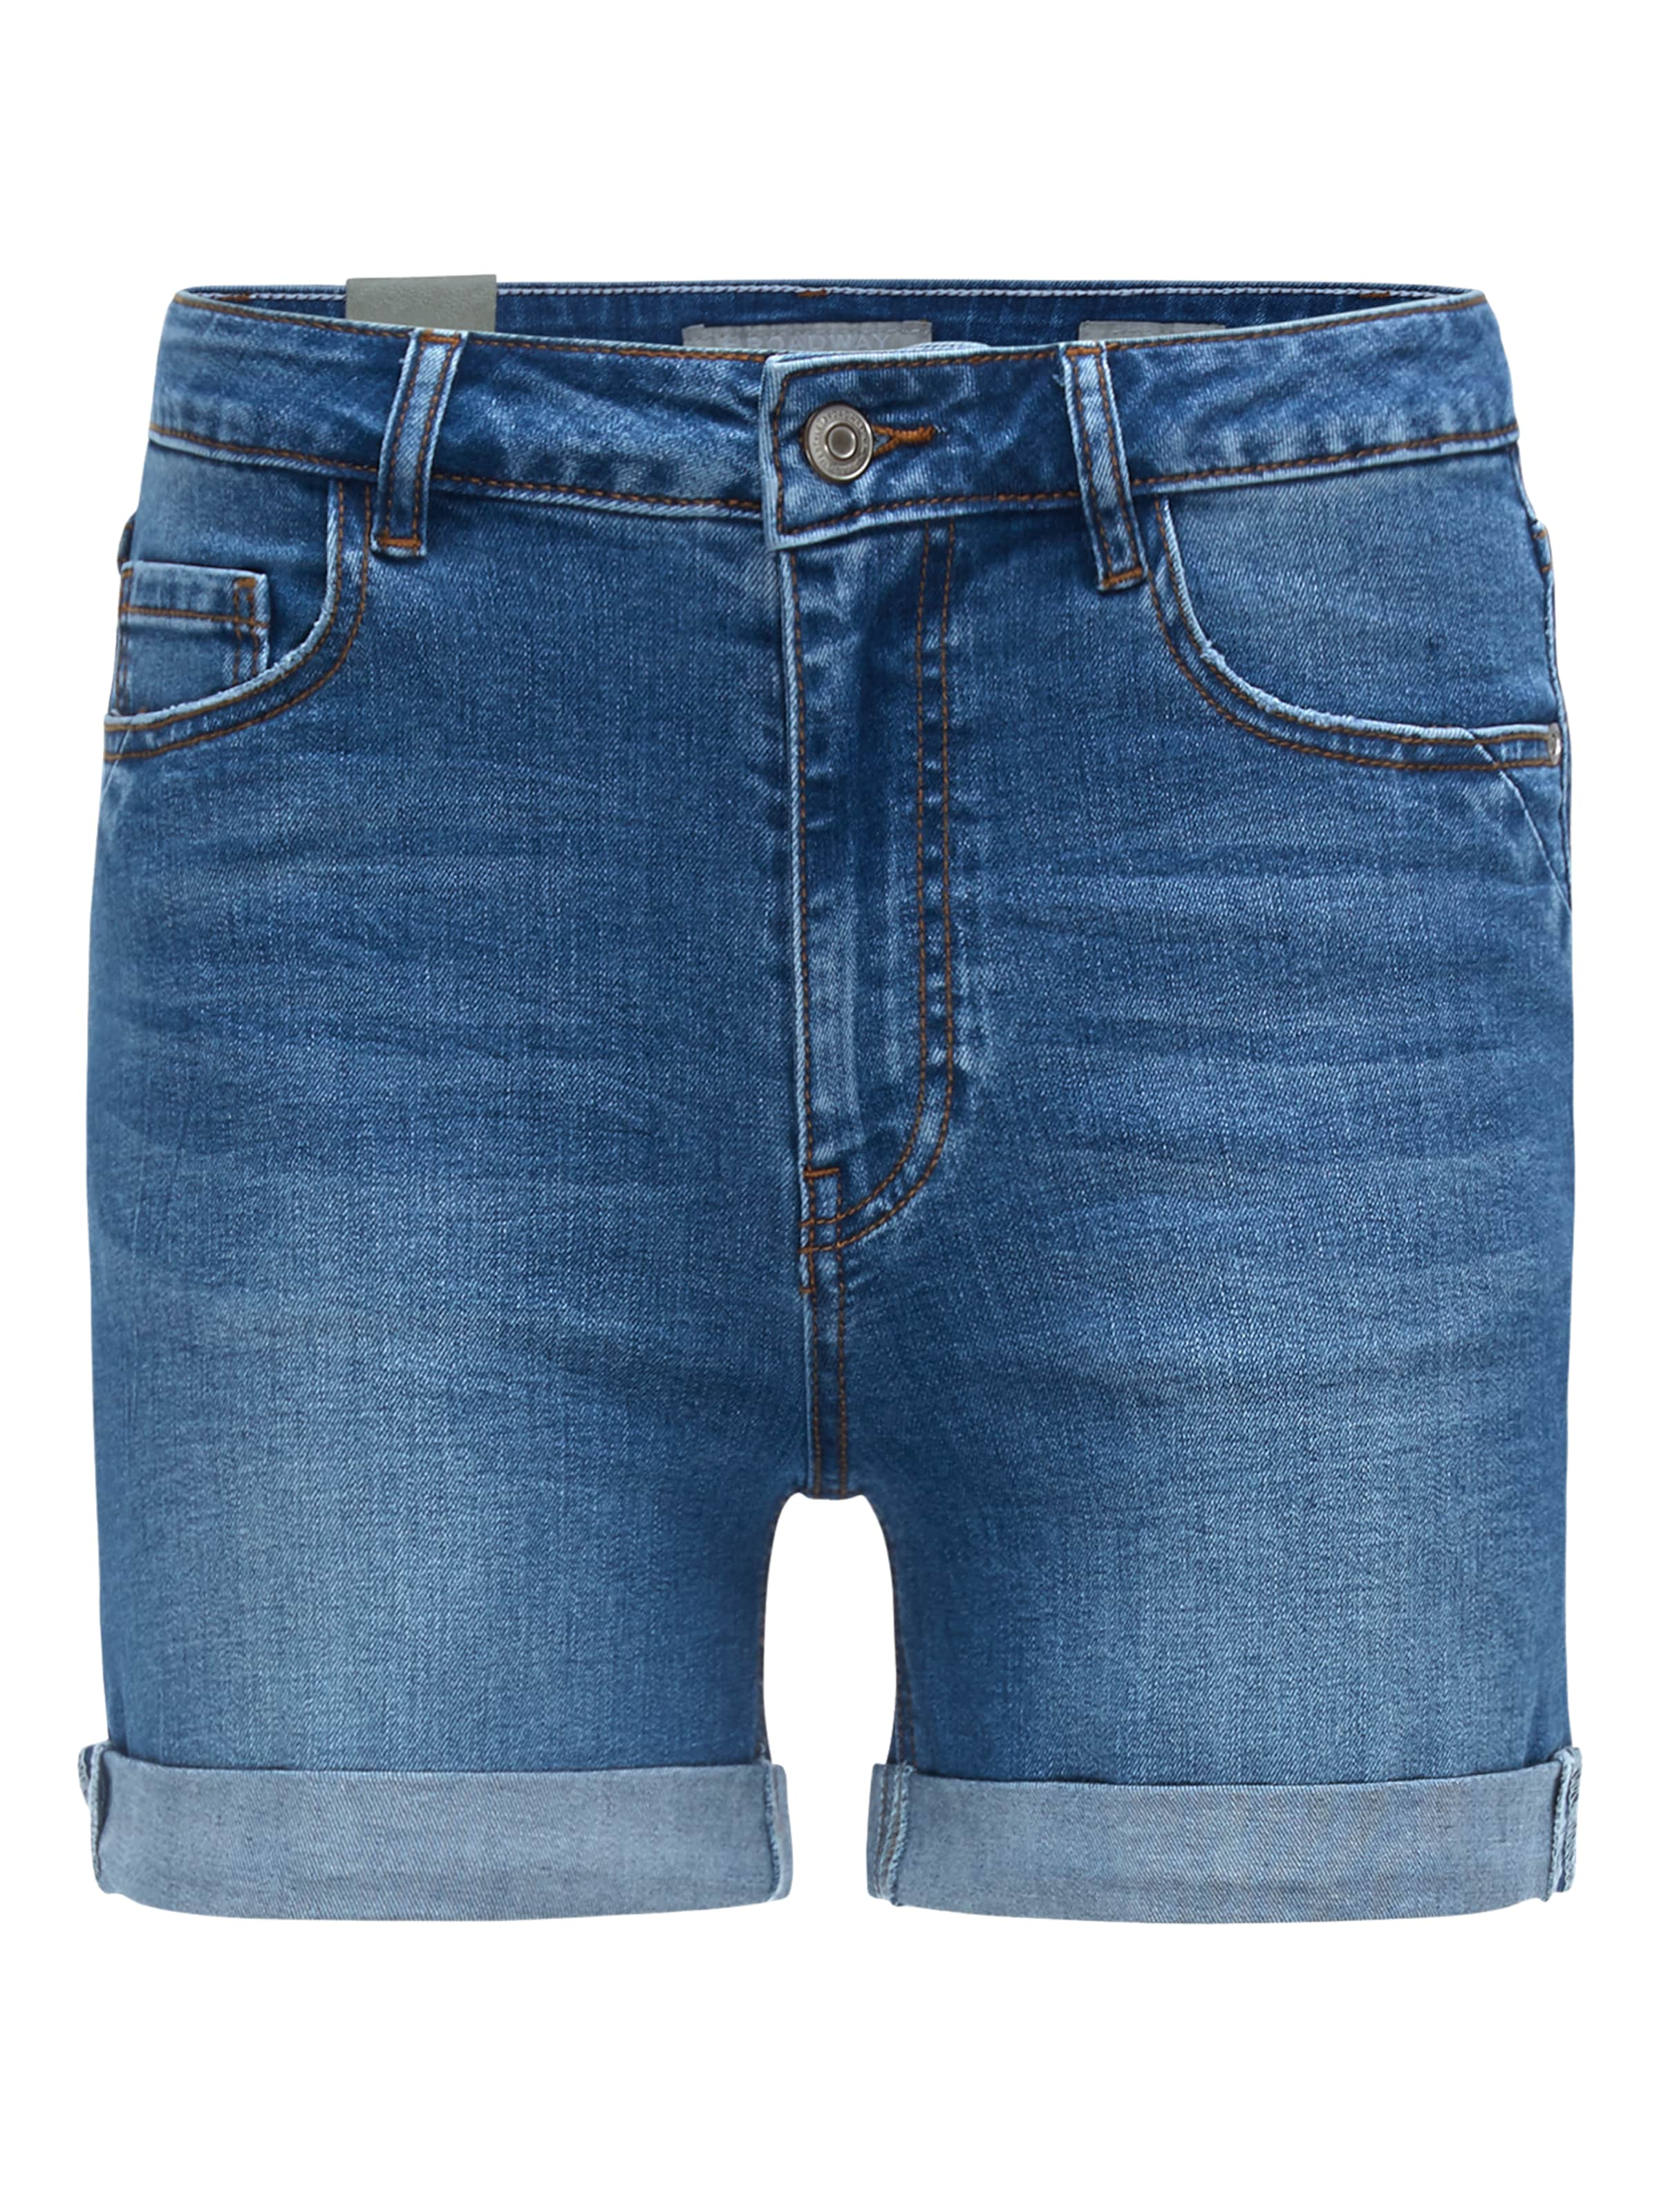 2862' Fashion In Dunkelblau Shorts Nyc Broadway 'lou bY76vyIfgm